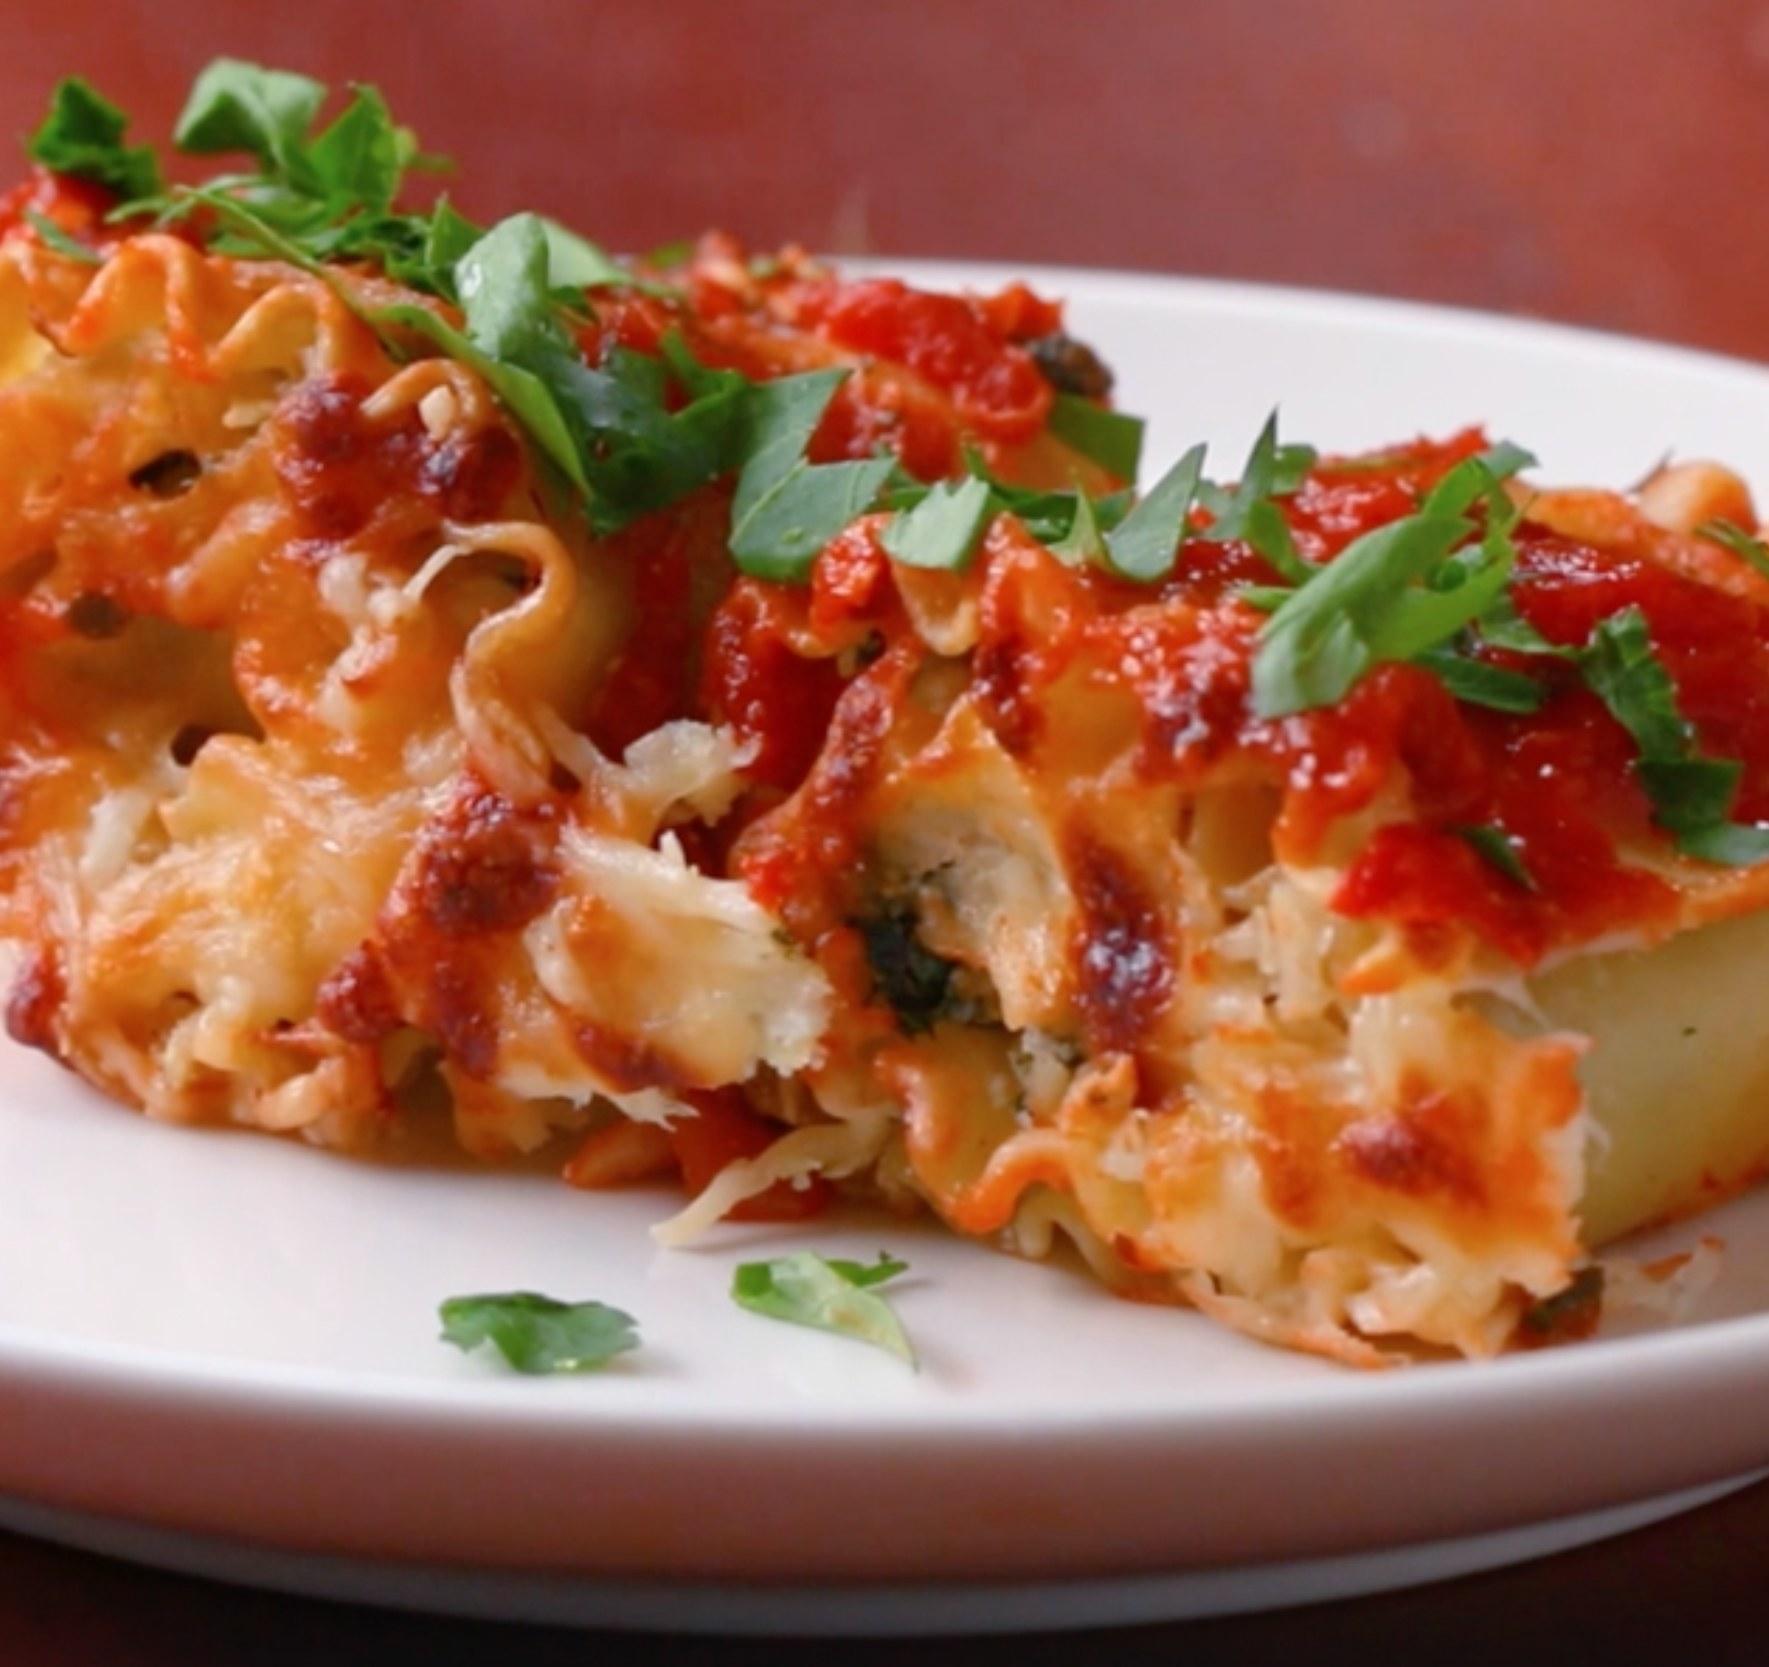 Spinach lasagna rollup